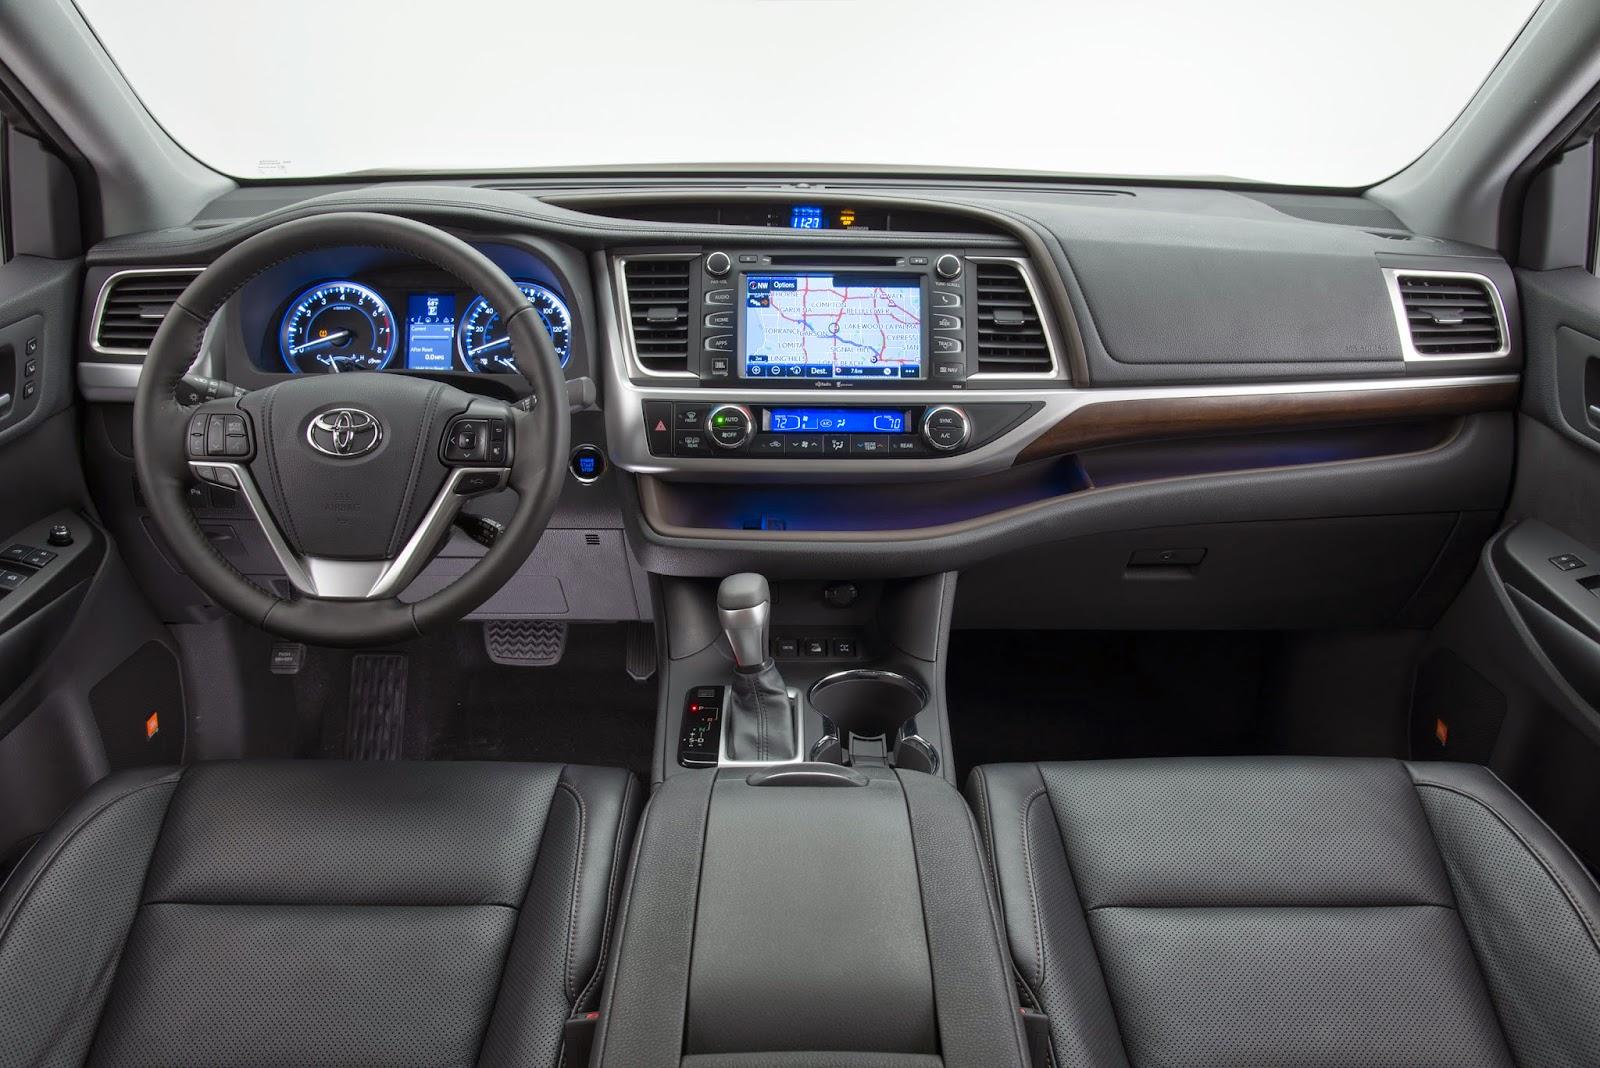 Interior view of 2014 Toyota Highlander